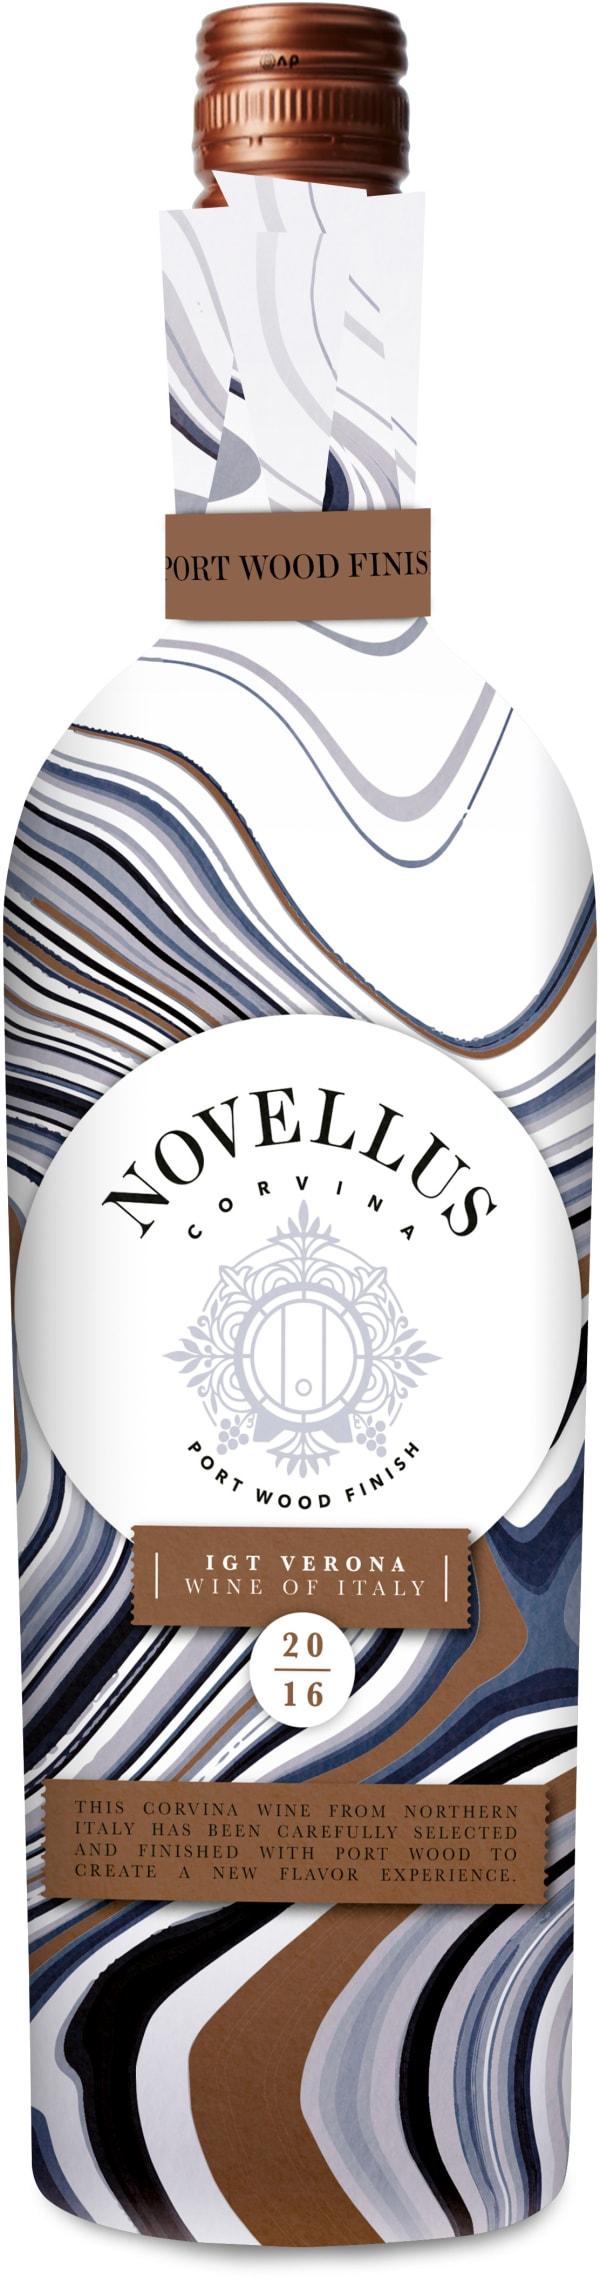 Novellus Corvina Port Wood Finish